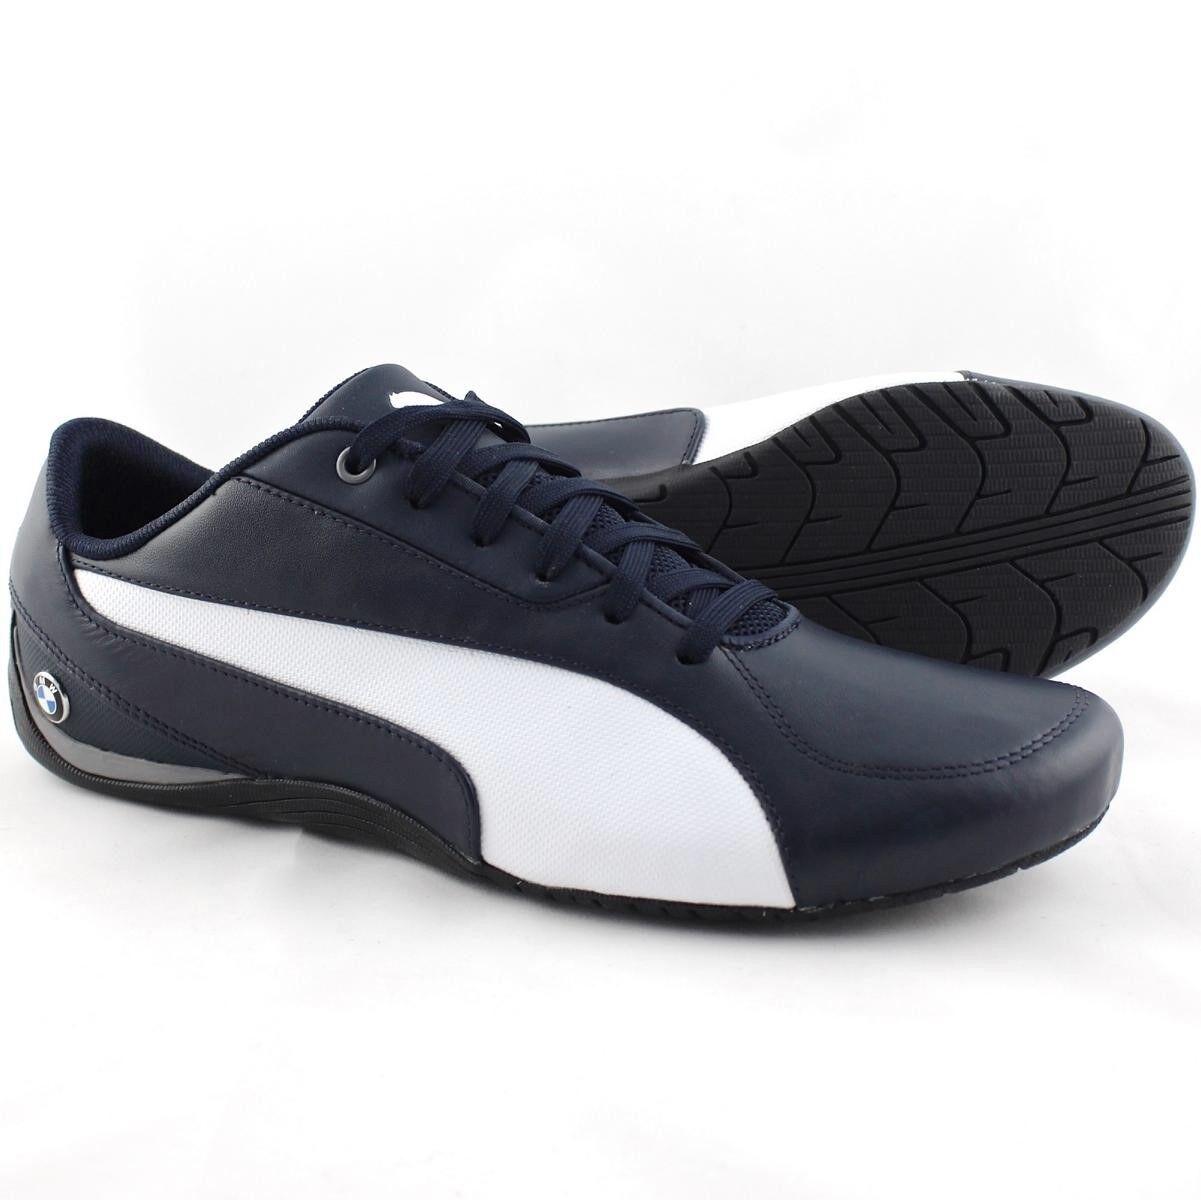 Puma bmw MS Drift Cat 5 305783 02 Motorsport calcetines cortos zapatos caballero zapatos